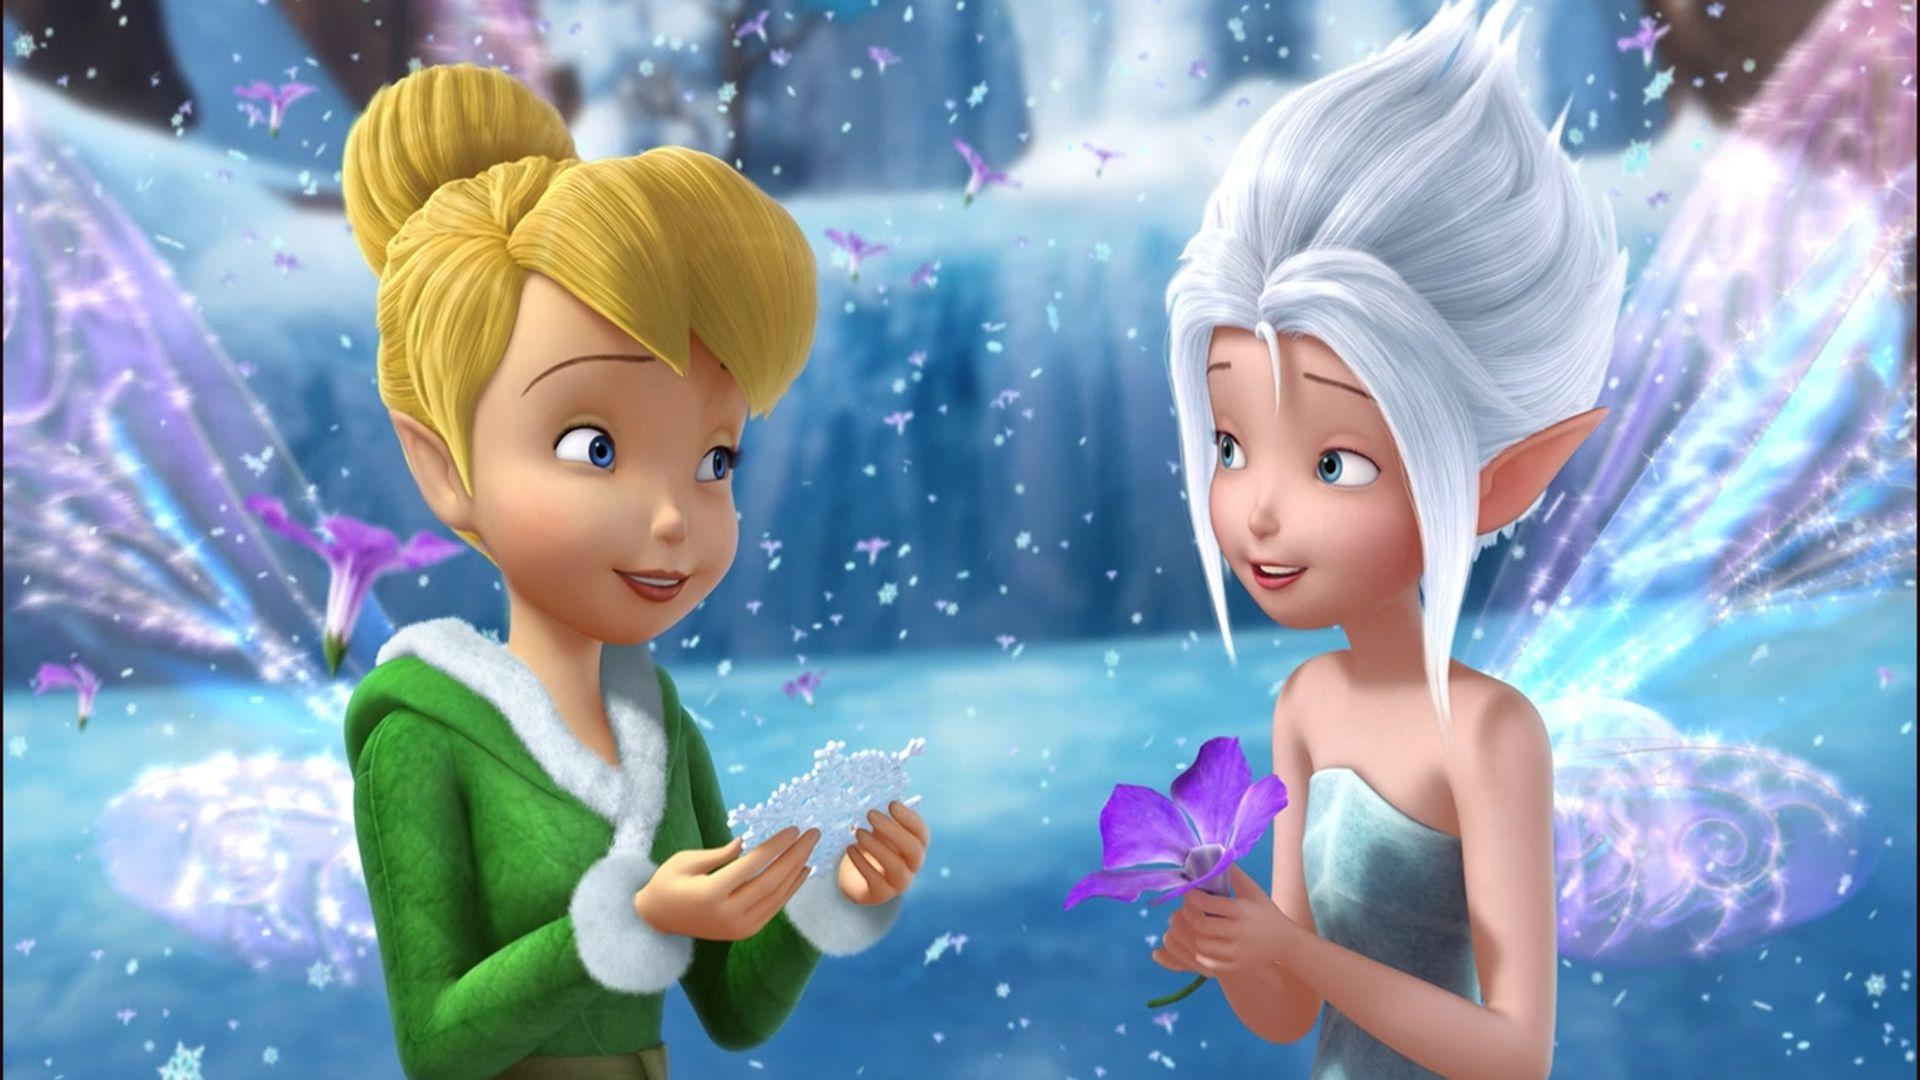 Download Secret Of The Wings Disney Fairies Tinker Bell Cartoon For Kids Fantasy Adventure Hd Wallpaper Disney Fairies Tinkerbell And Friends Periwinkle Fairy